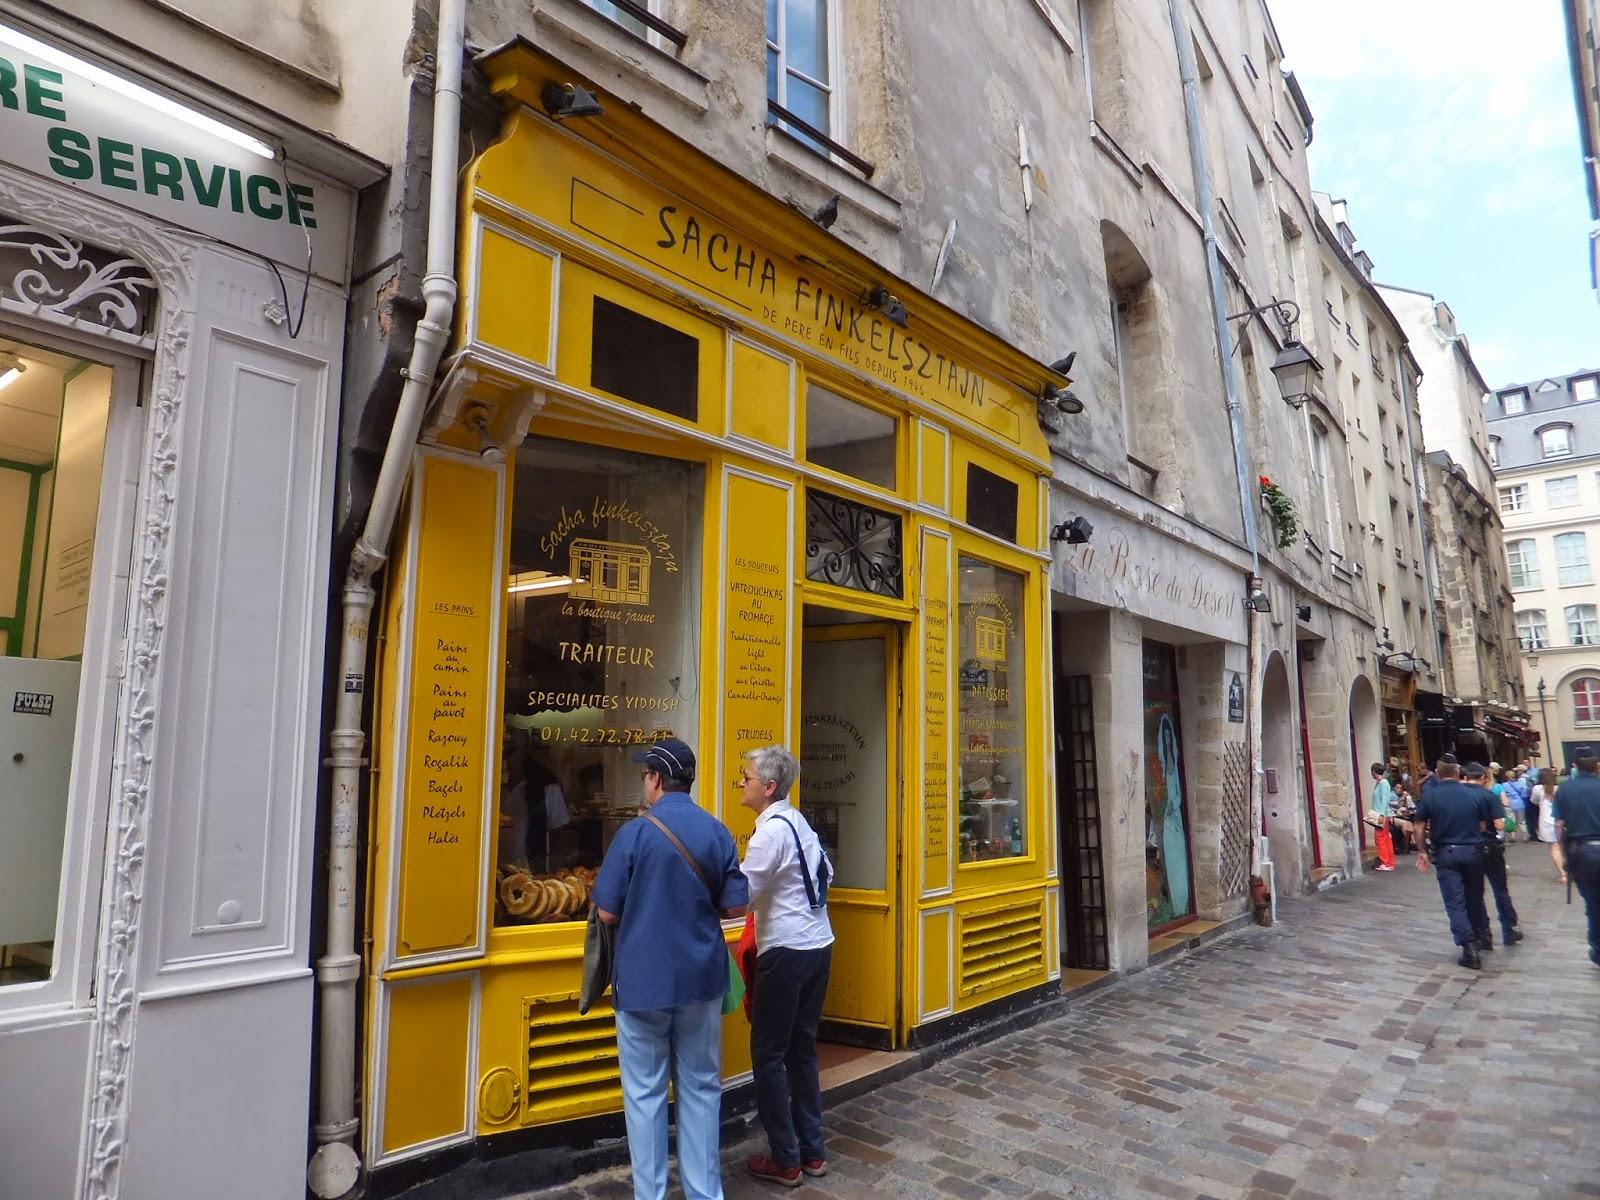 Sacha Finkelsztain, Gregos, StreetArt, Le Marais, París, Elisa N, Blog de Viajes, Lifestyle, Travel